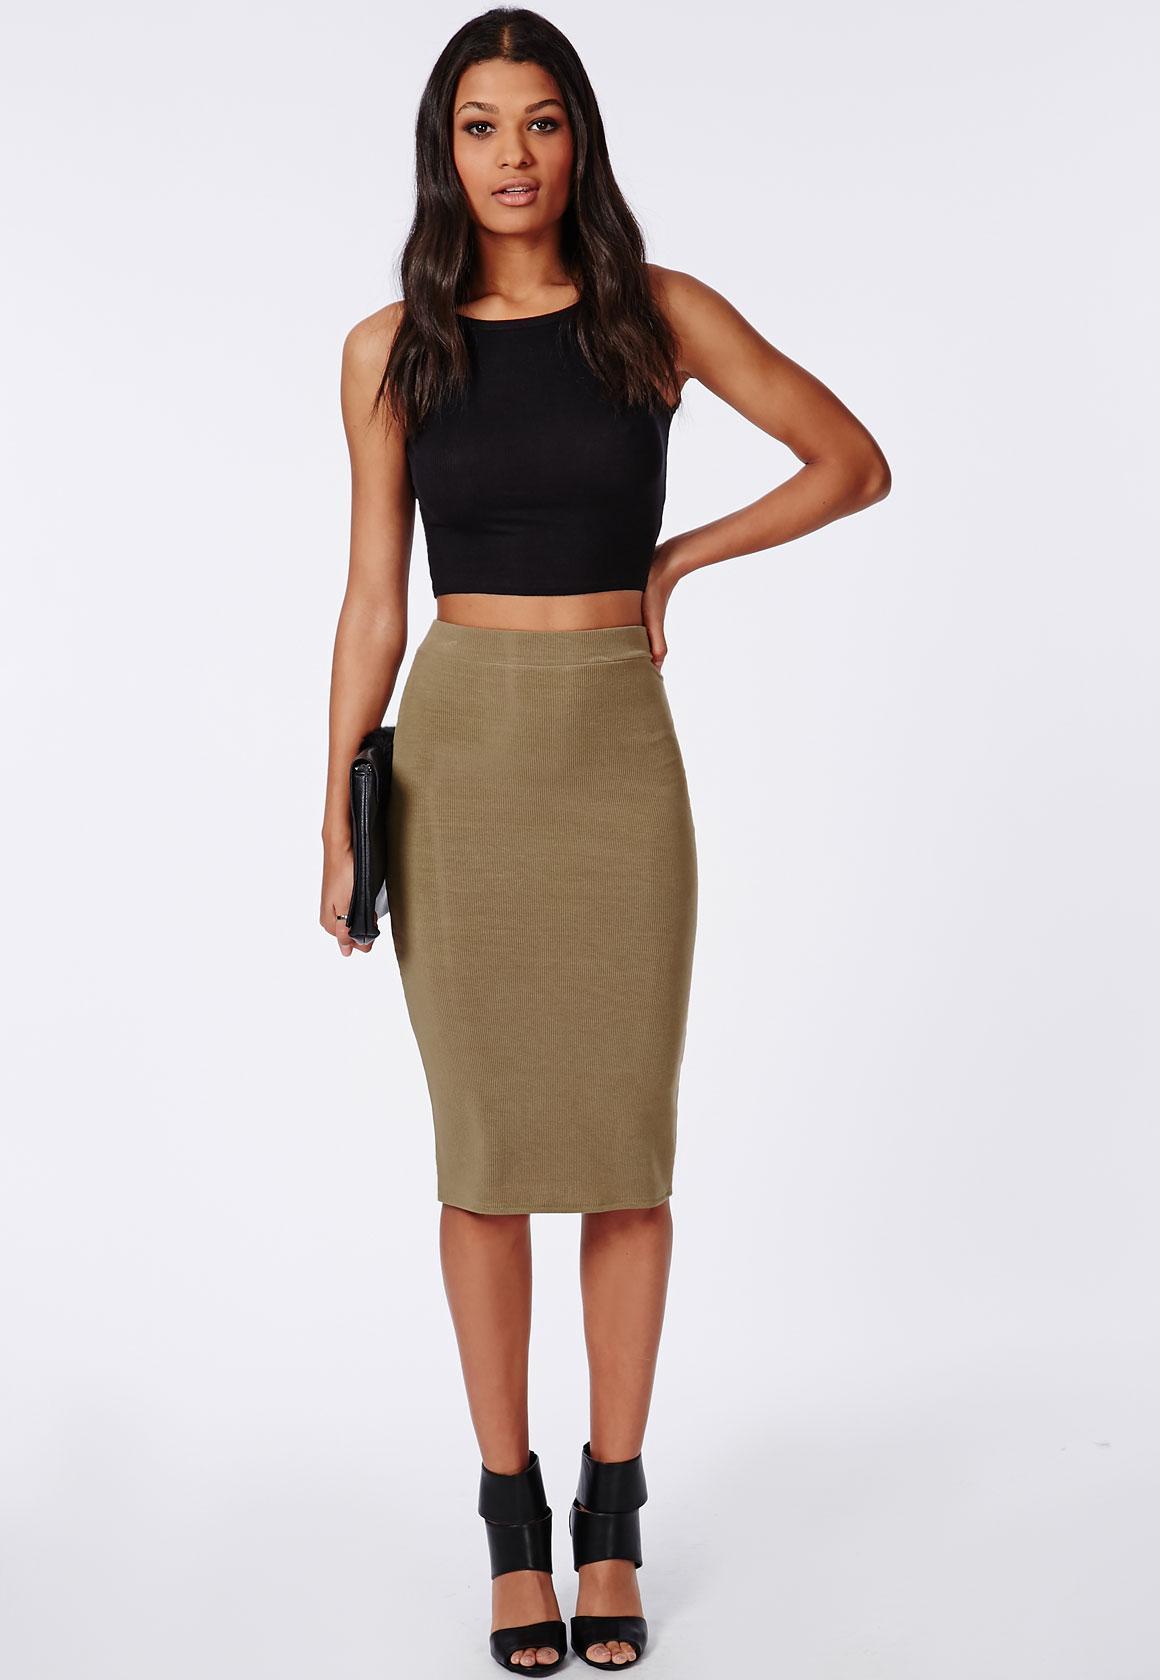 Ribbed Bodycon Midi Skirt Khaki - Skirts - Missguided